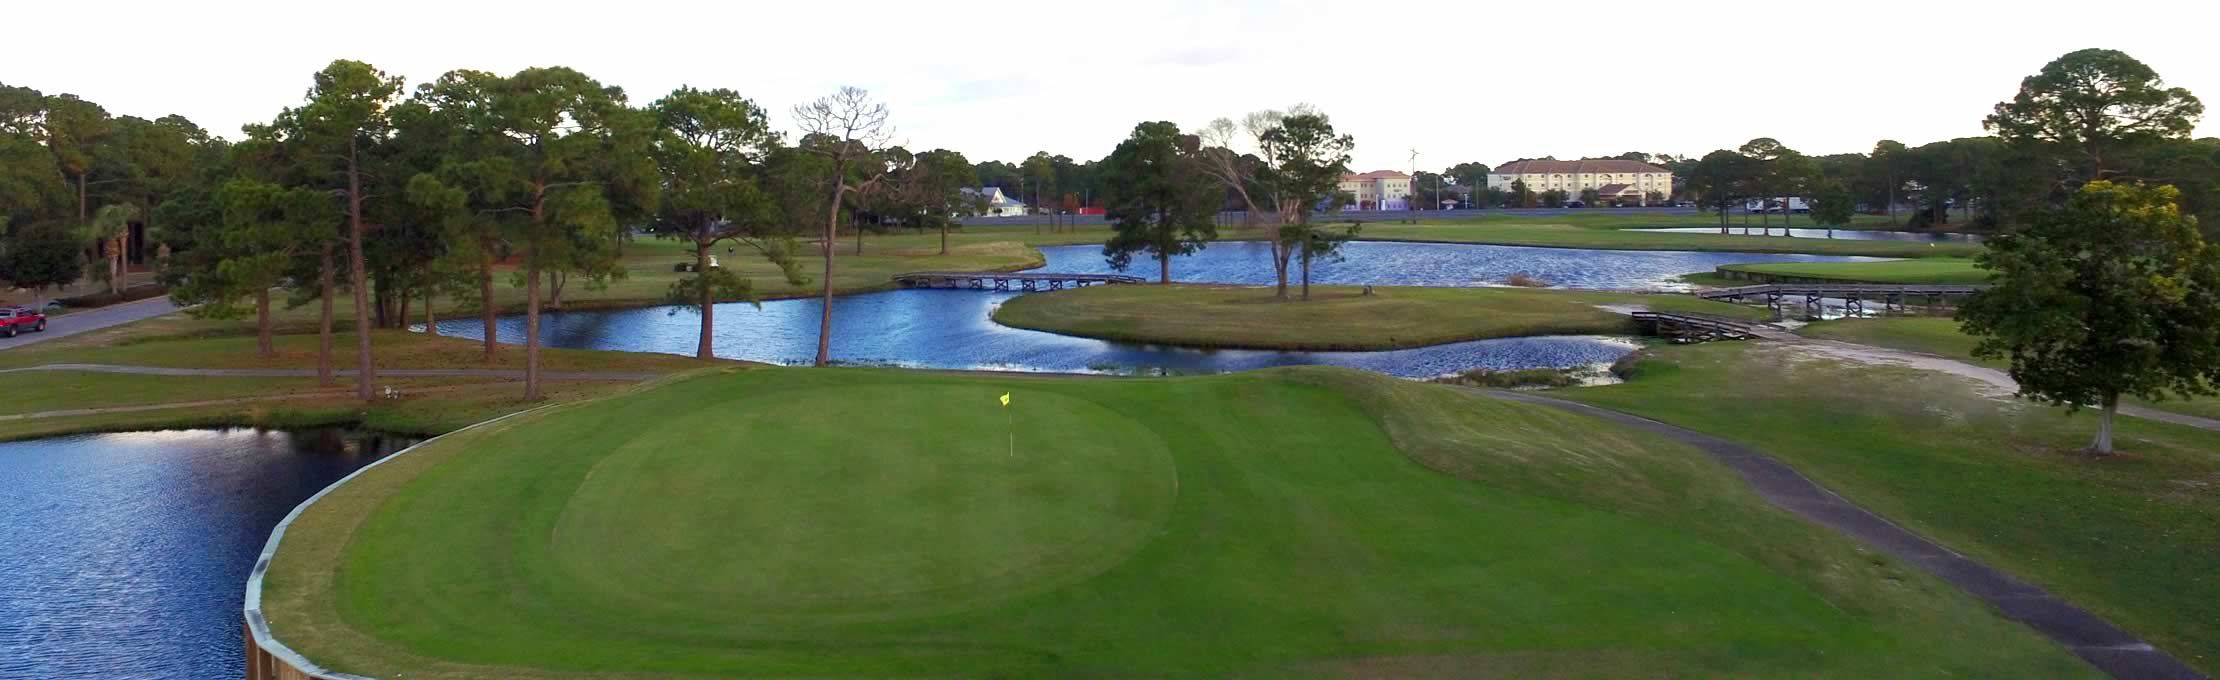 Seascape Golf Resort in Destin